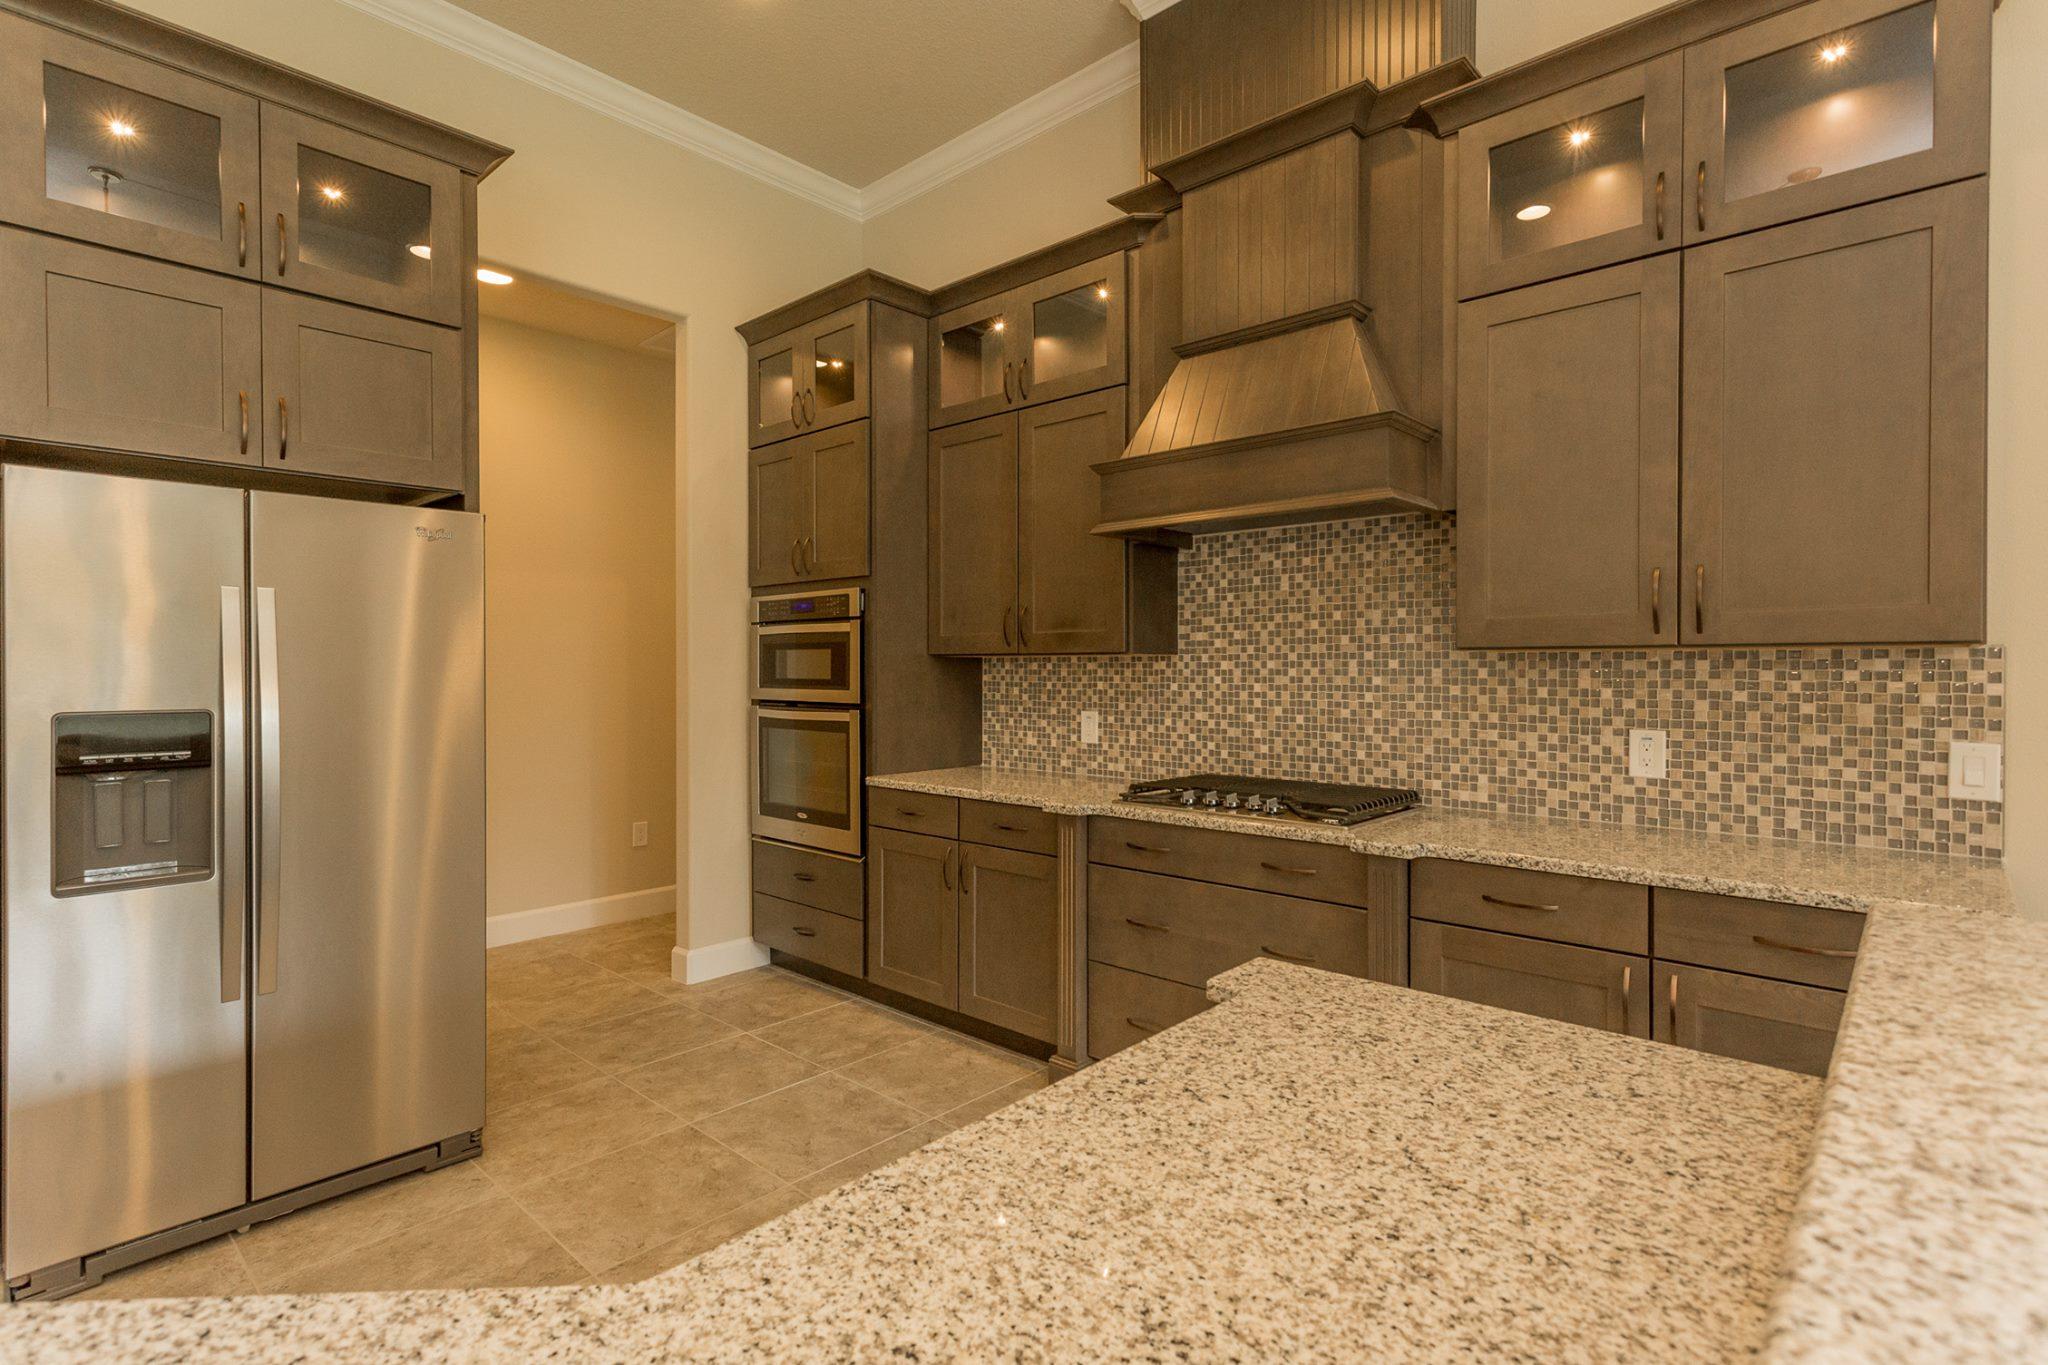 New Kitchen Countertop Options